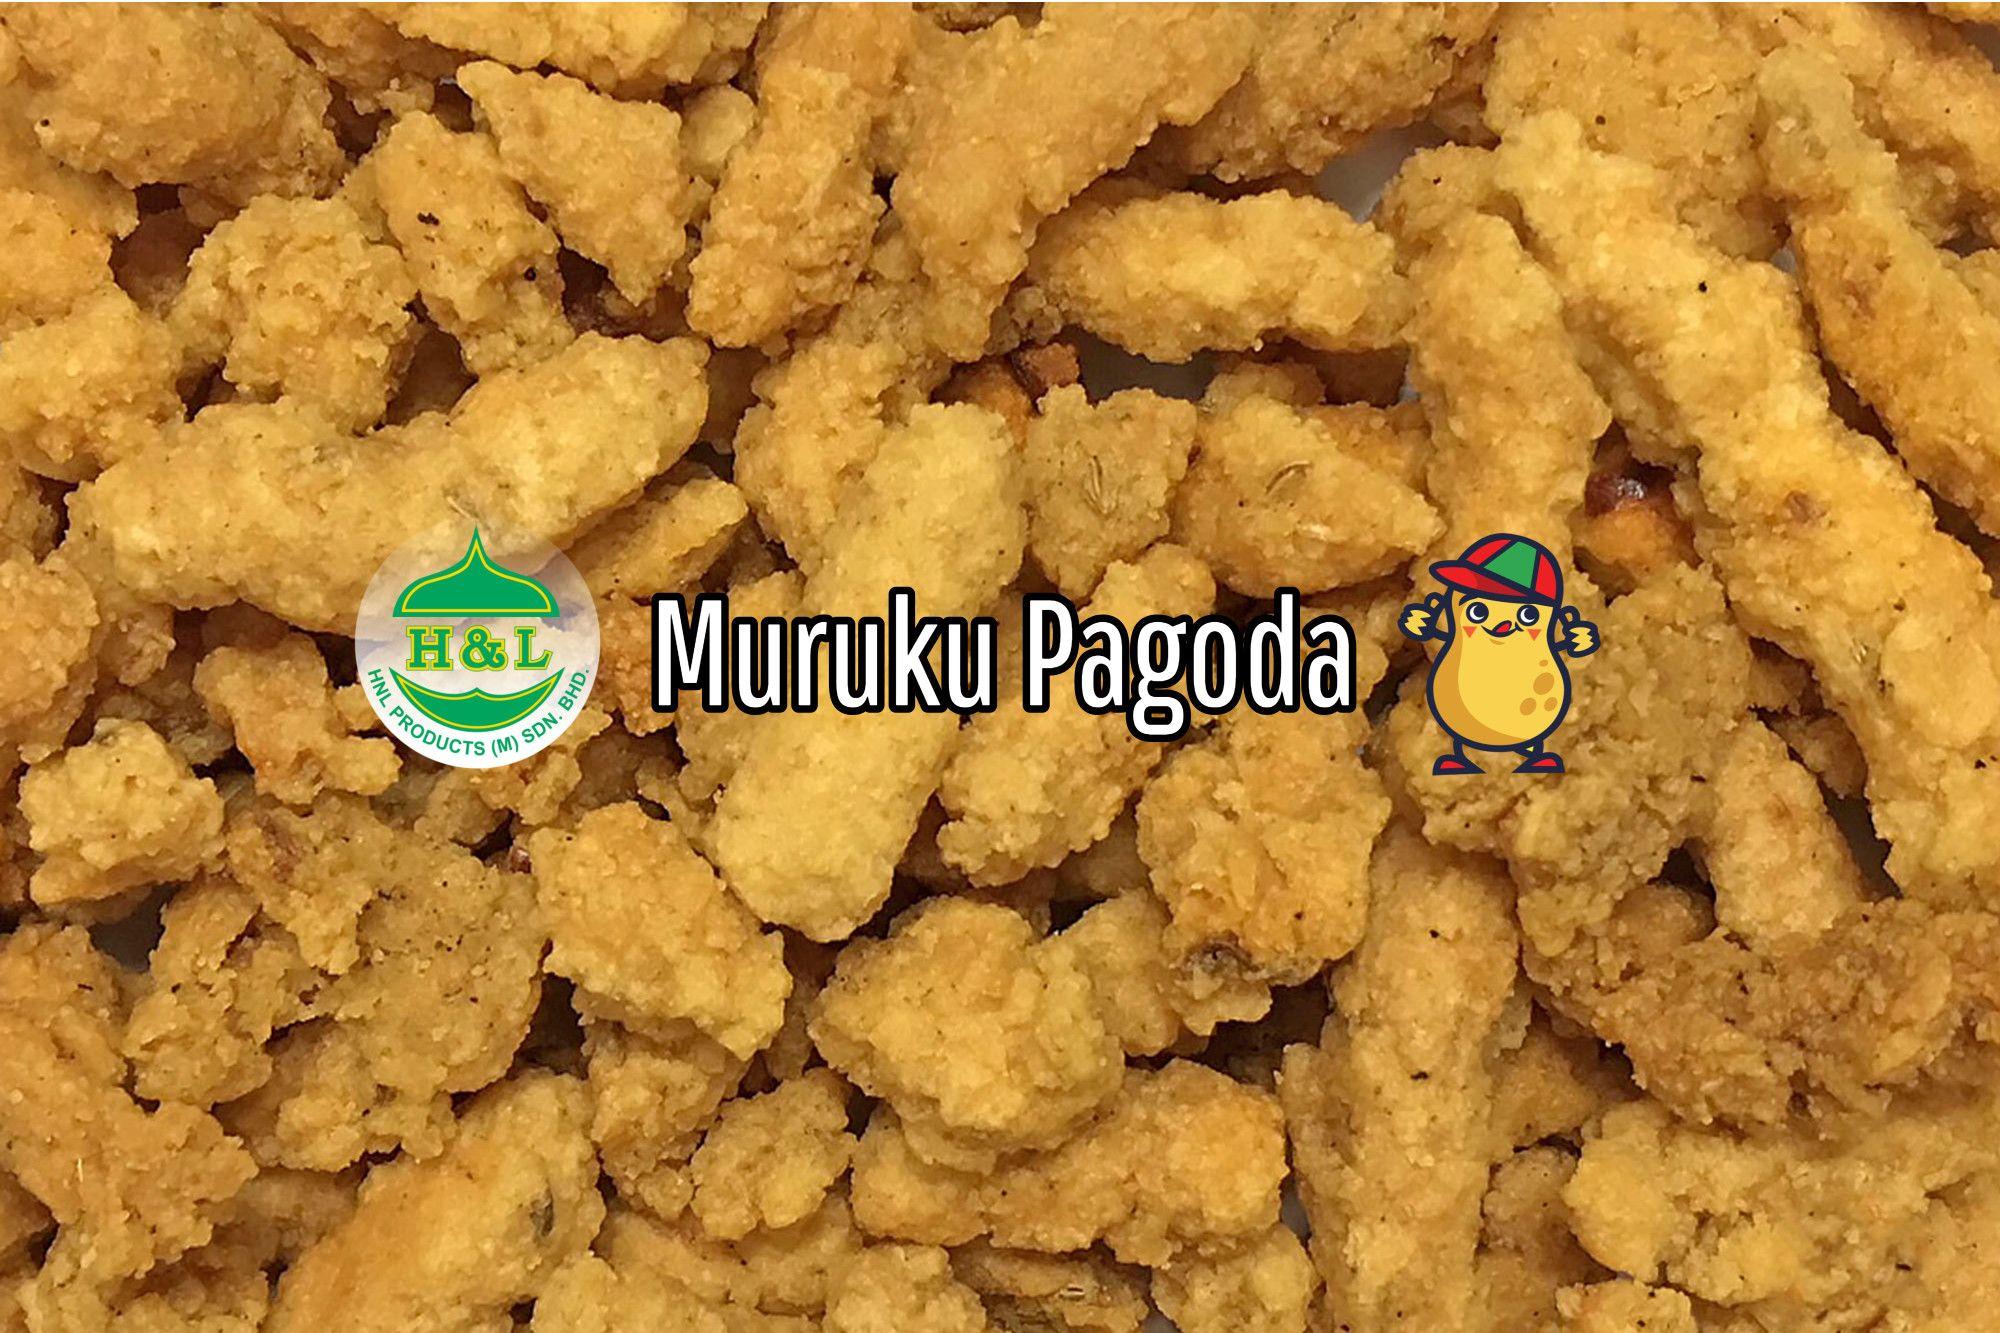 Muruku Pagoda Food Snacks Snack Recipes